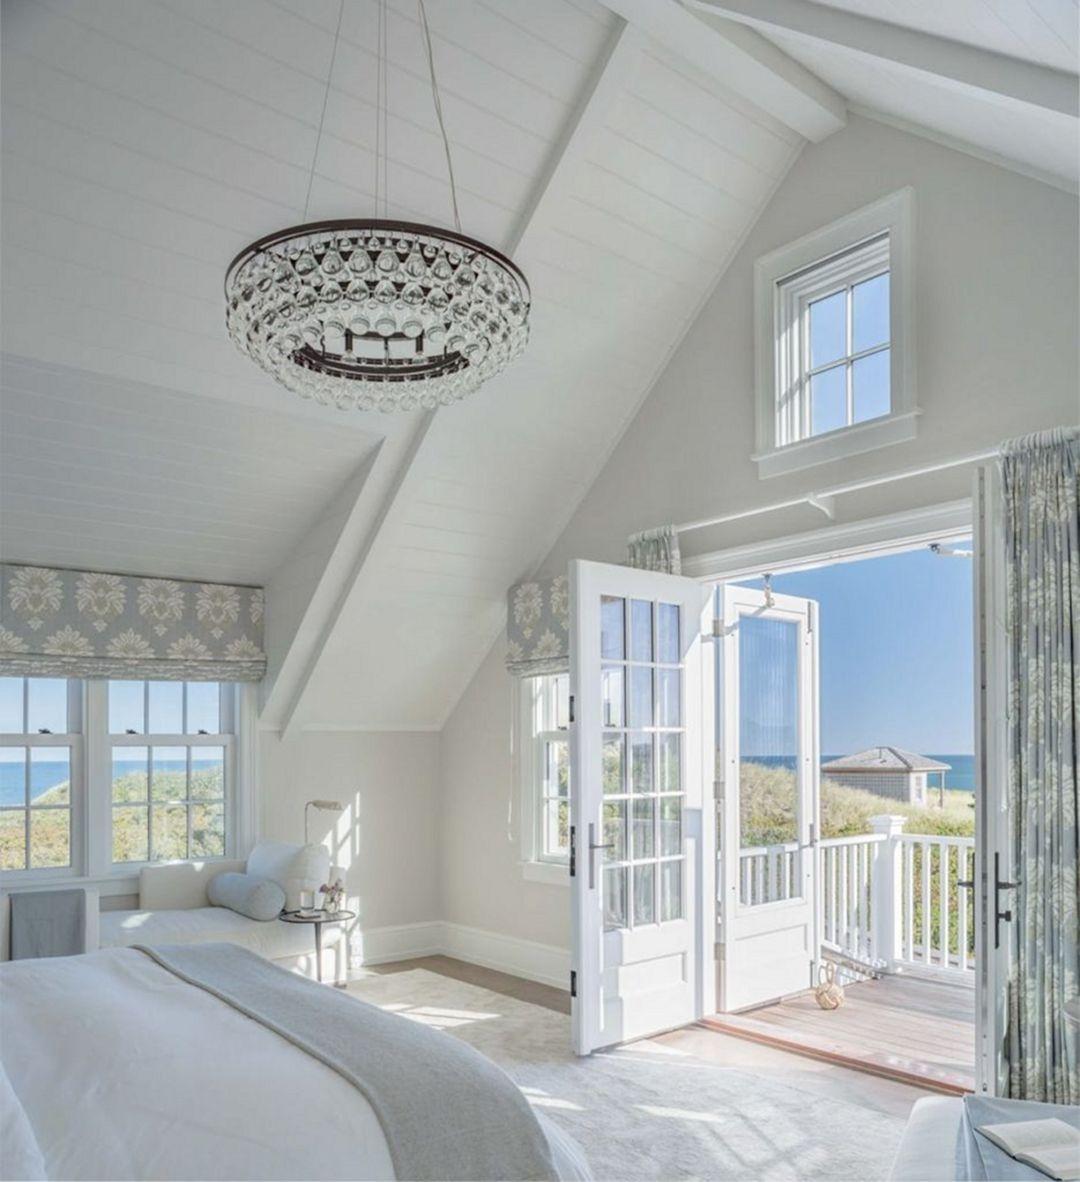 45 Elegant White Beach House Design